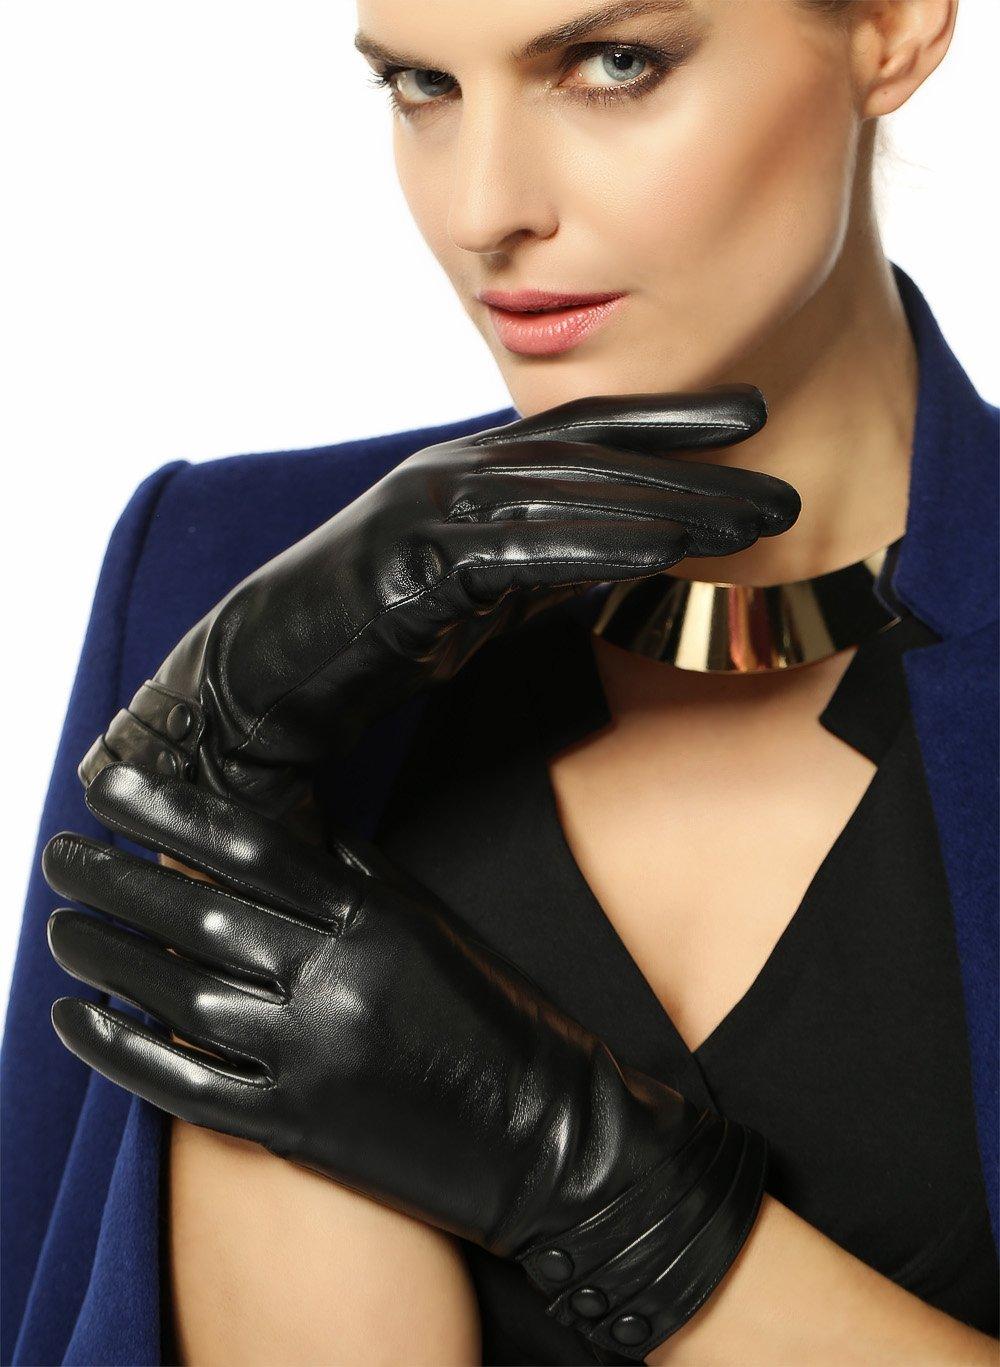 Warmen Women's Touchscreen Texting Driving Winter Warm Nappa Leather Gloves - 6.5 (US Standard size) - Black ( Fleece Lining ) by WARMEN (Image #3)